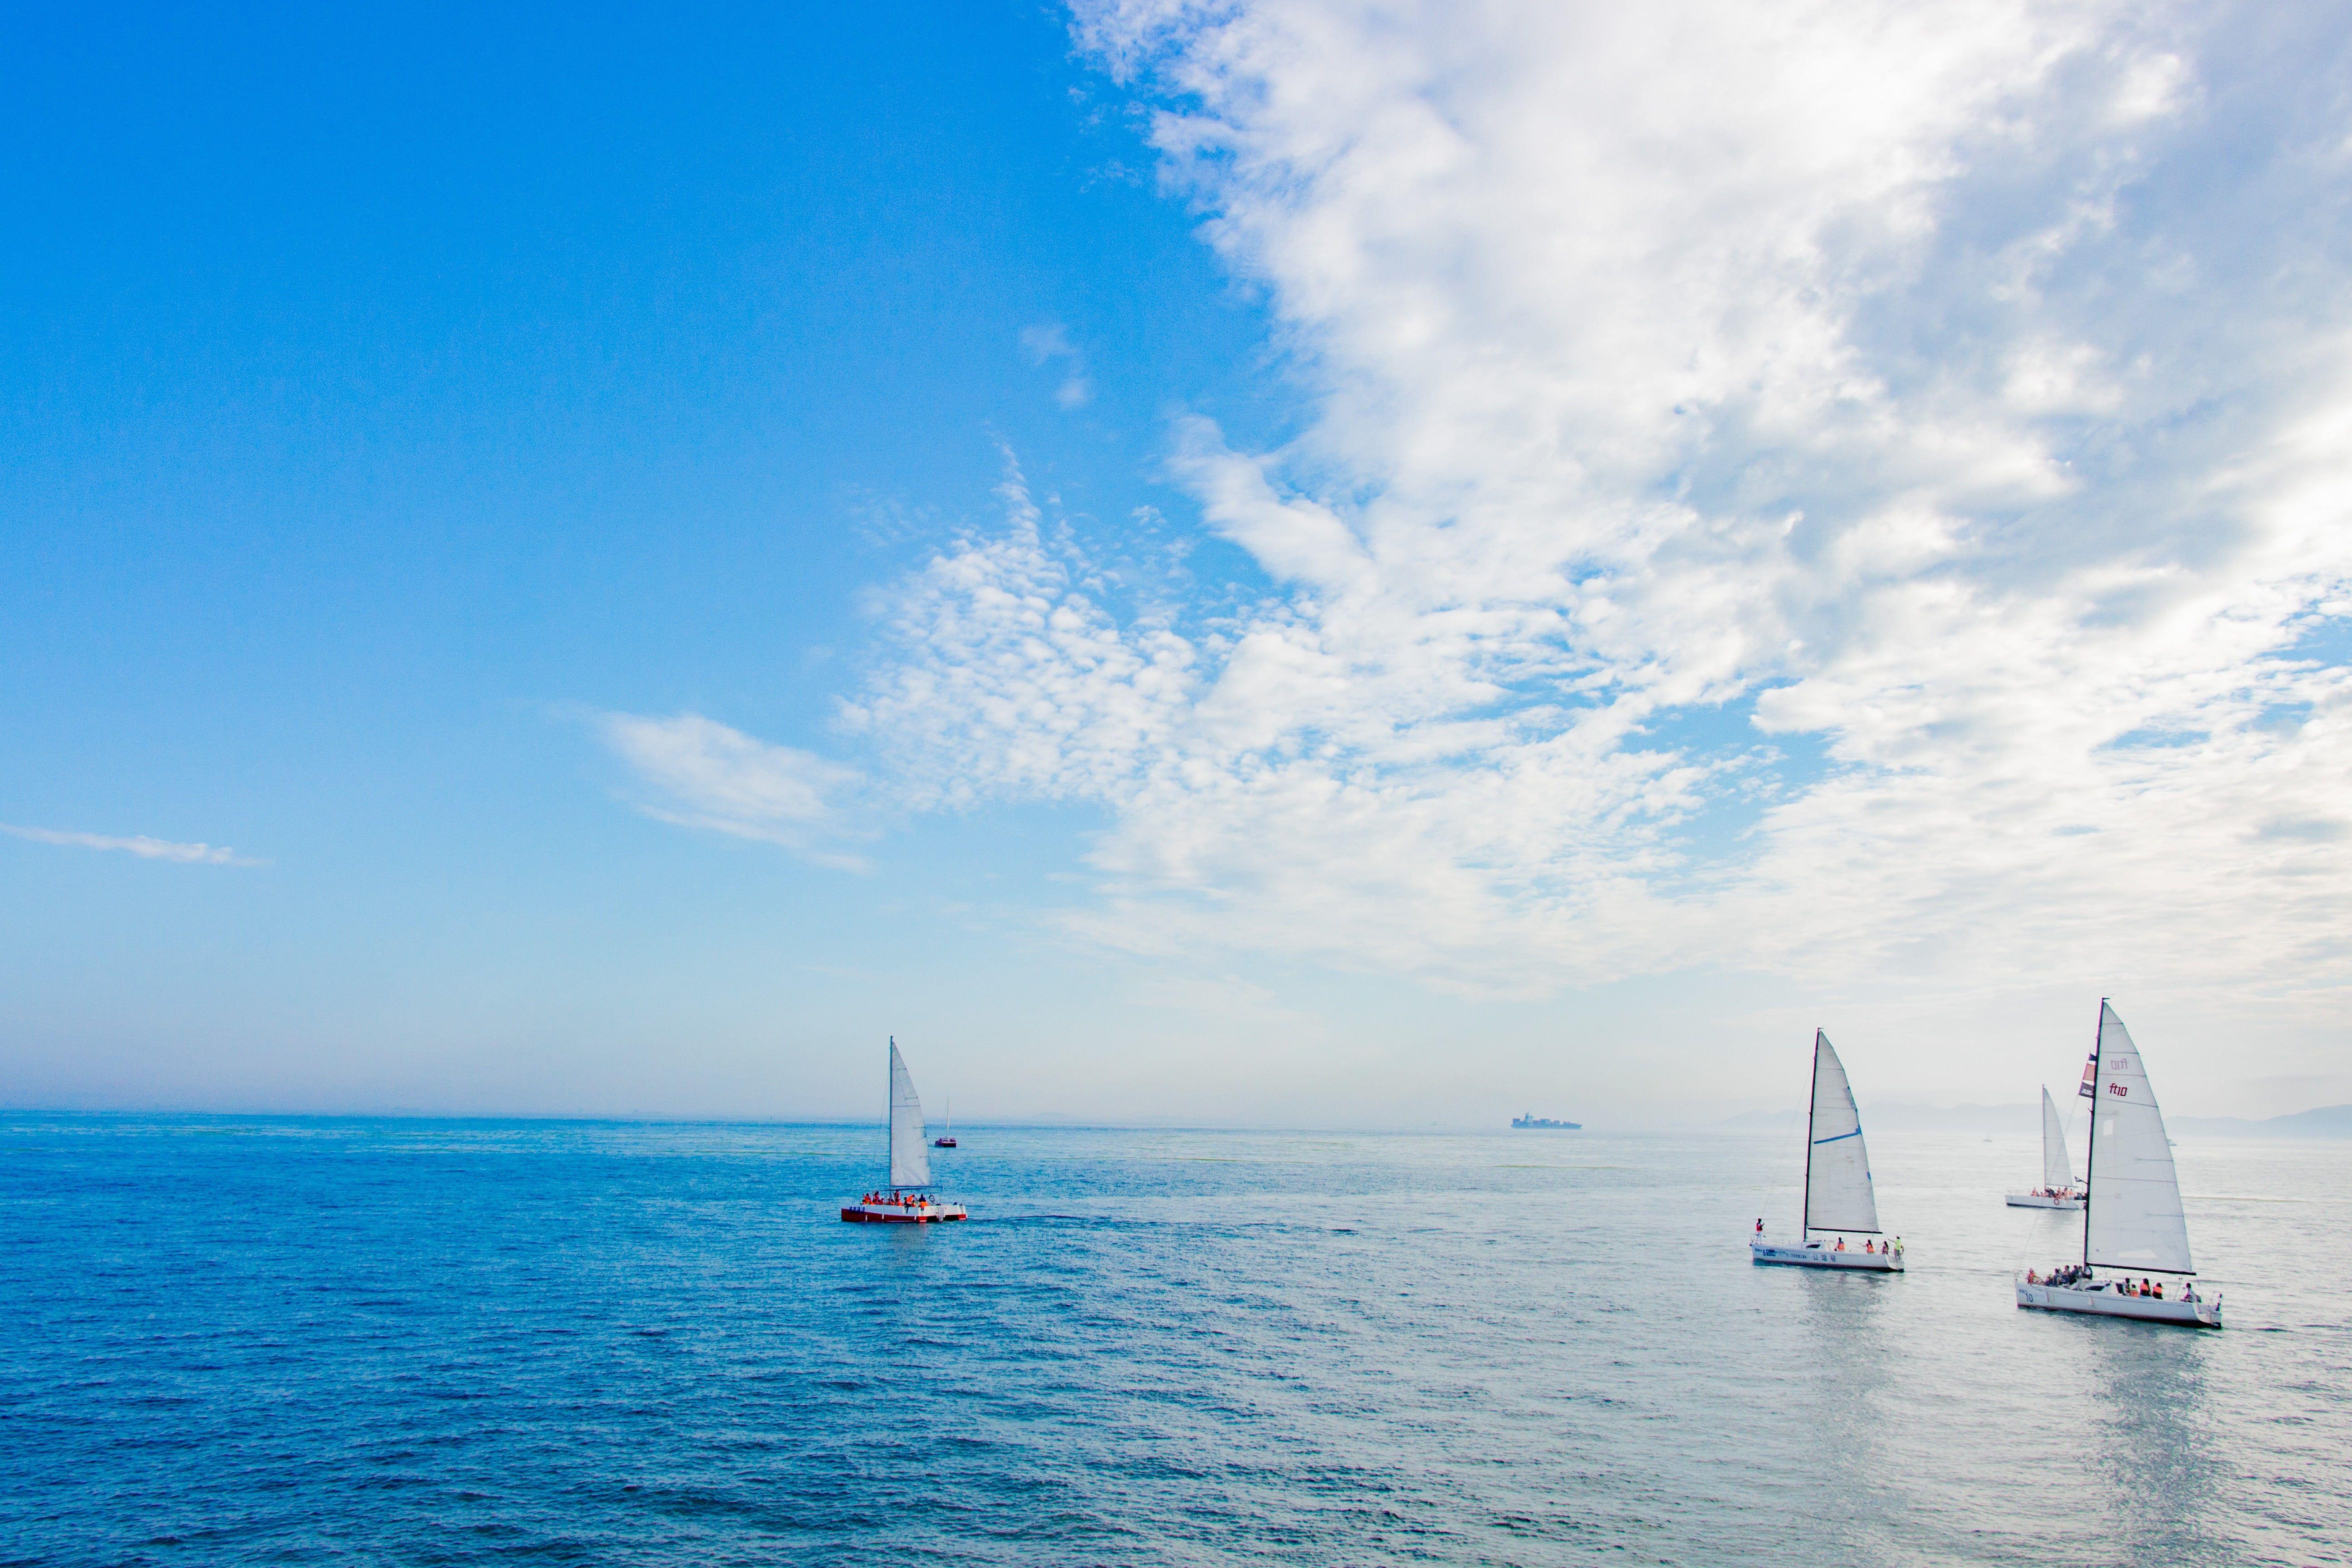 Four White Sailboats Sea Sailing Ship Sky Water 5k Wallpaper Hdwallpaper Desktop Sailing Ships Sailing Sky